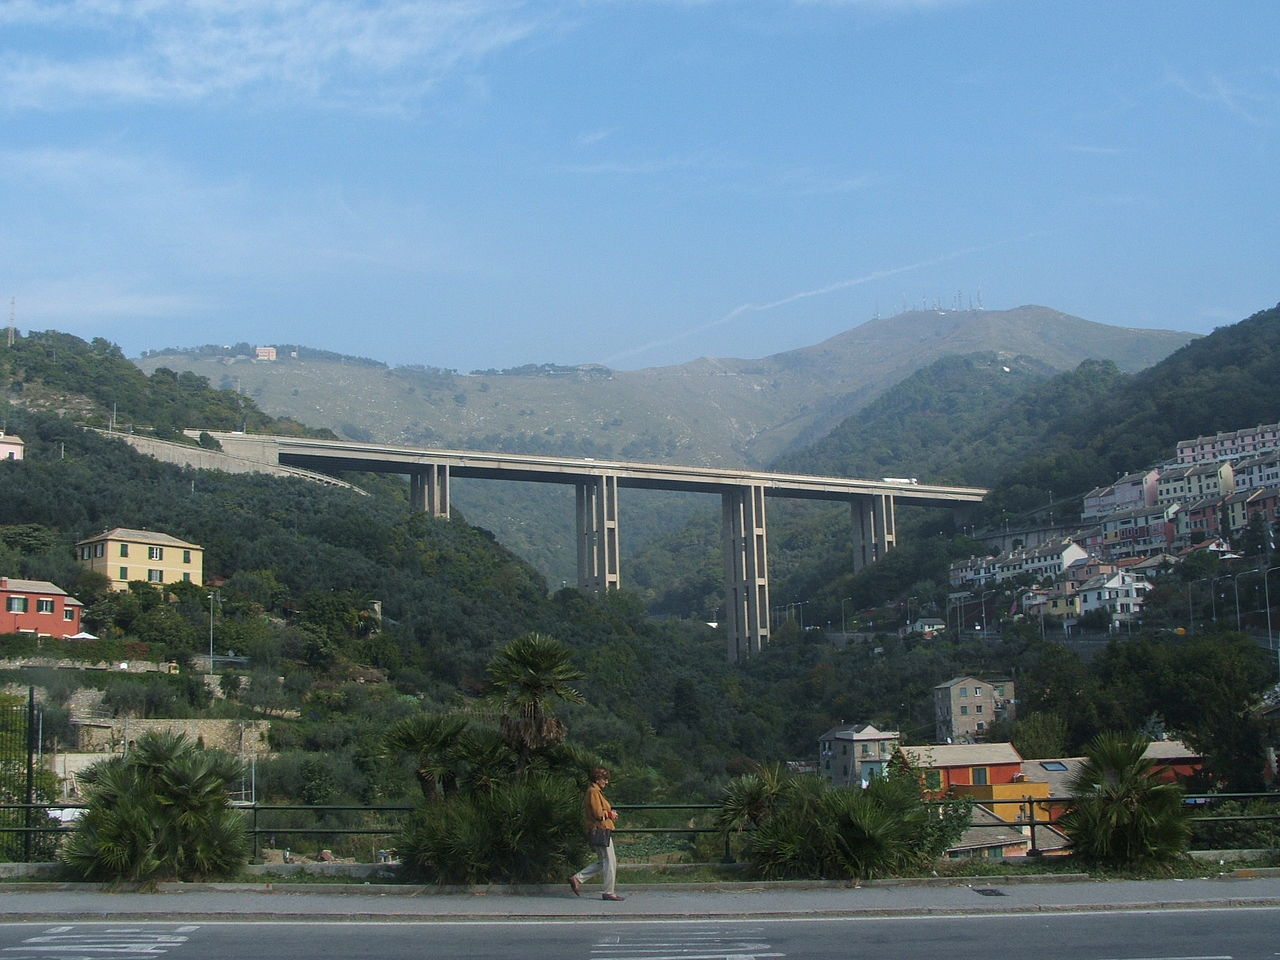 File:Genova - viadotto Bagnara.jpg - Wikimedia Commons